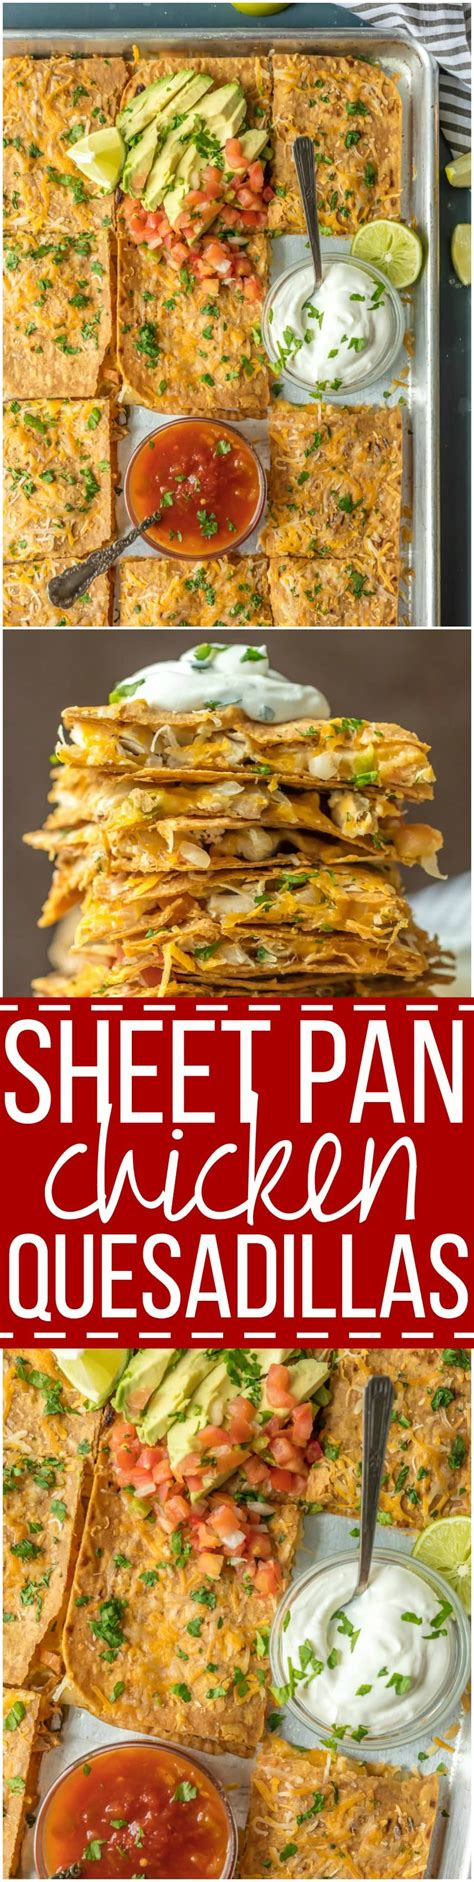 pan sheet quesadillas chicken quesadilla crowd thecookierookie recipe easiest